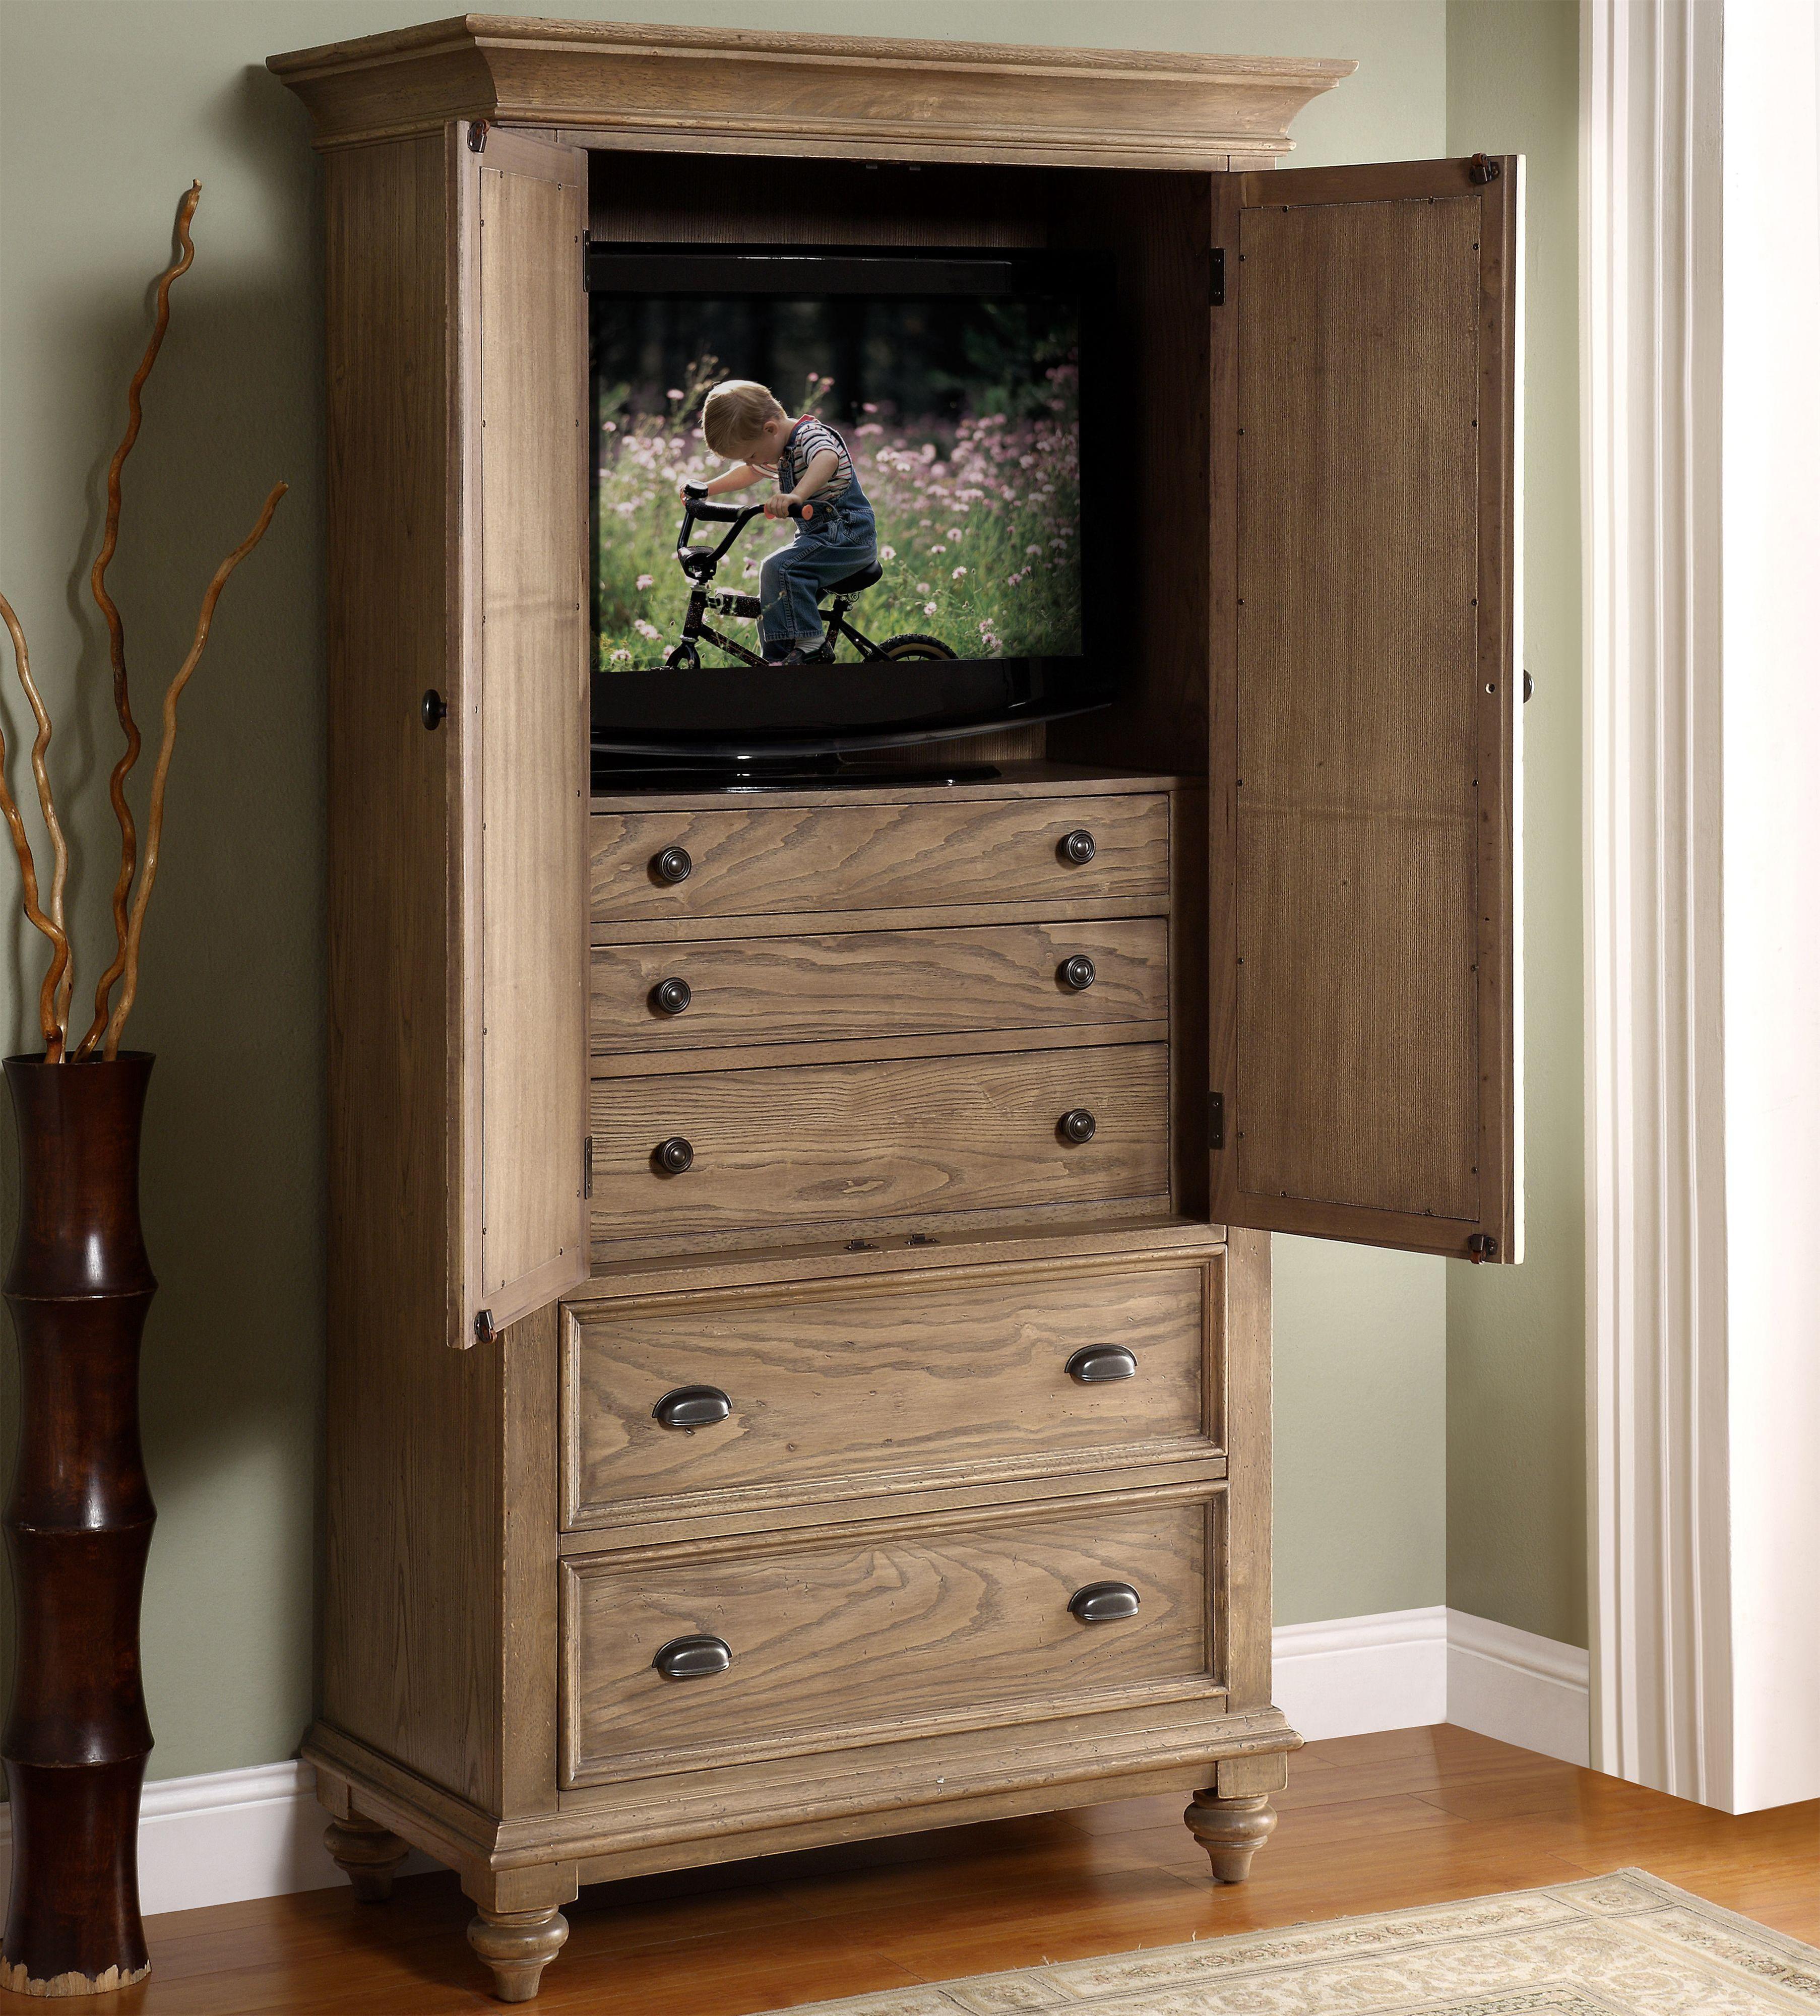 Riverside Furniture Coventry 32463 2 Door Mirror Armoire